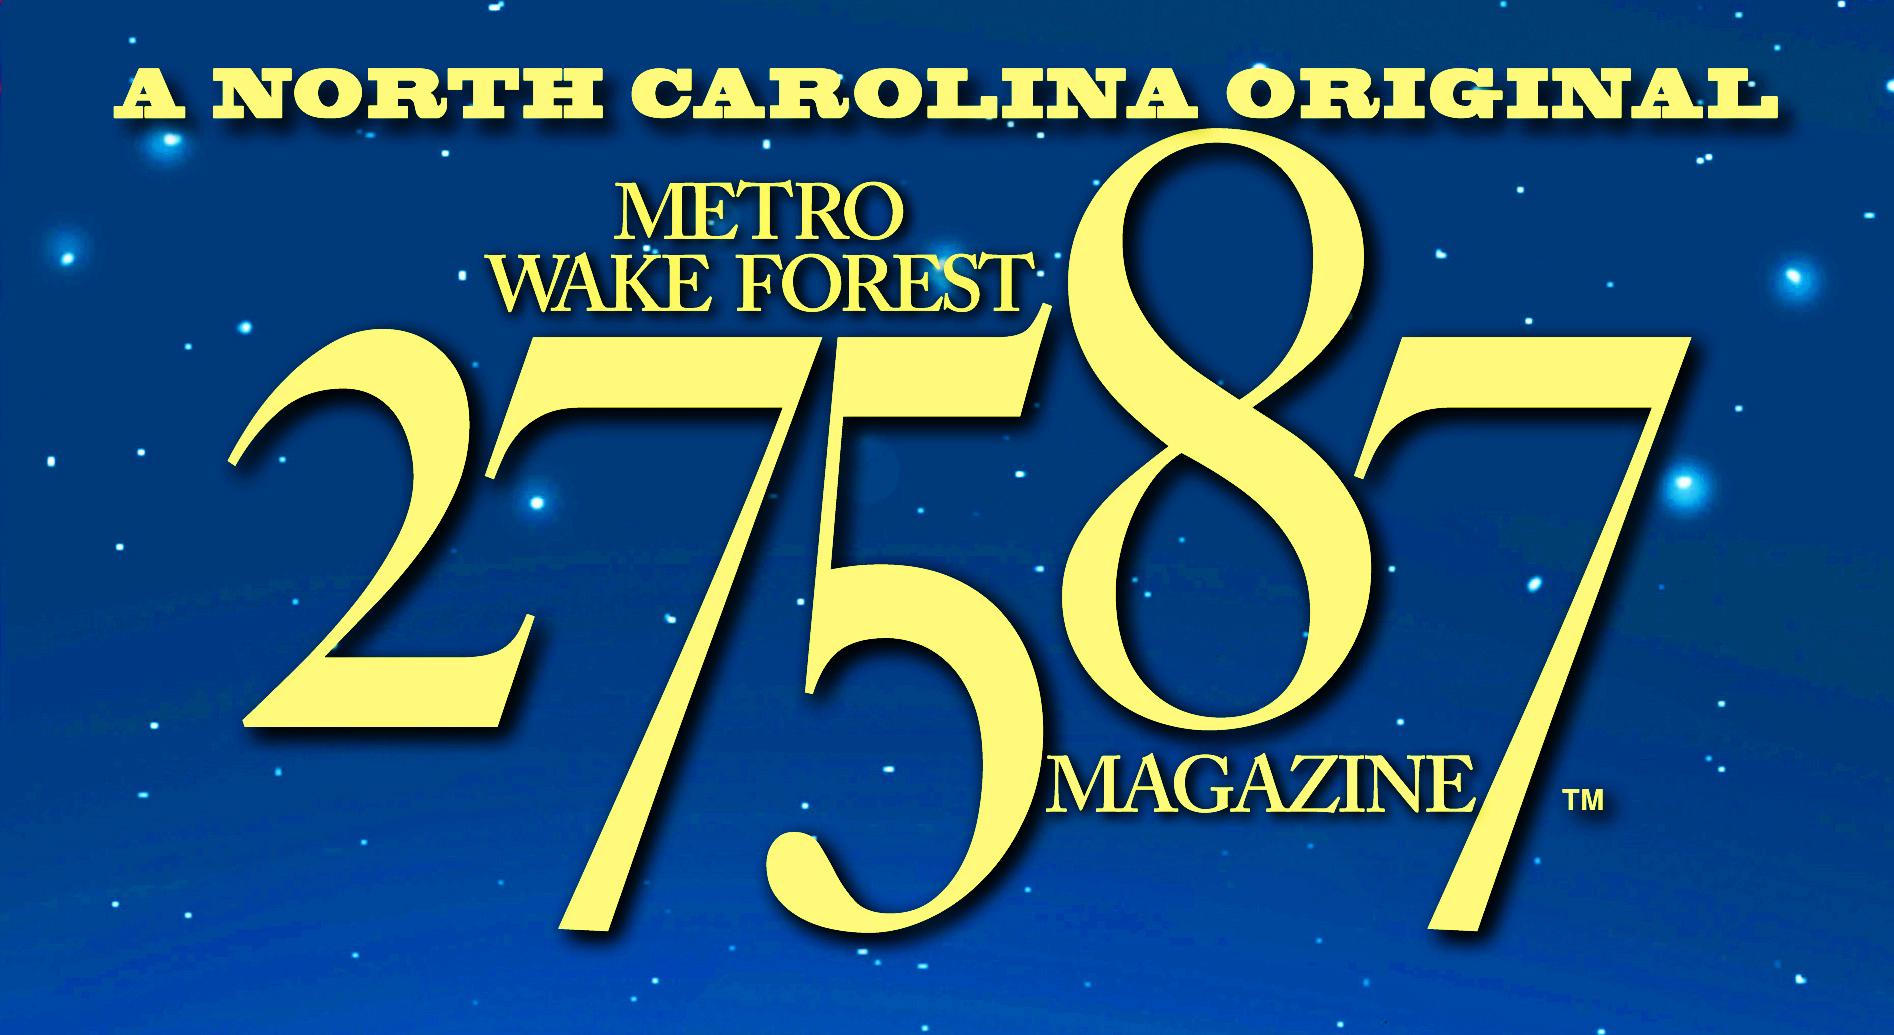 Sponsor 27587 Magazine